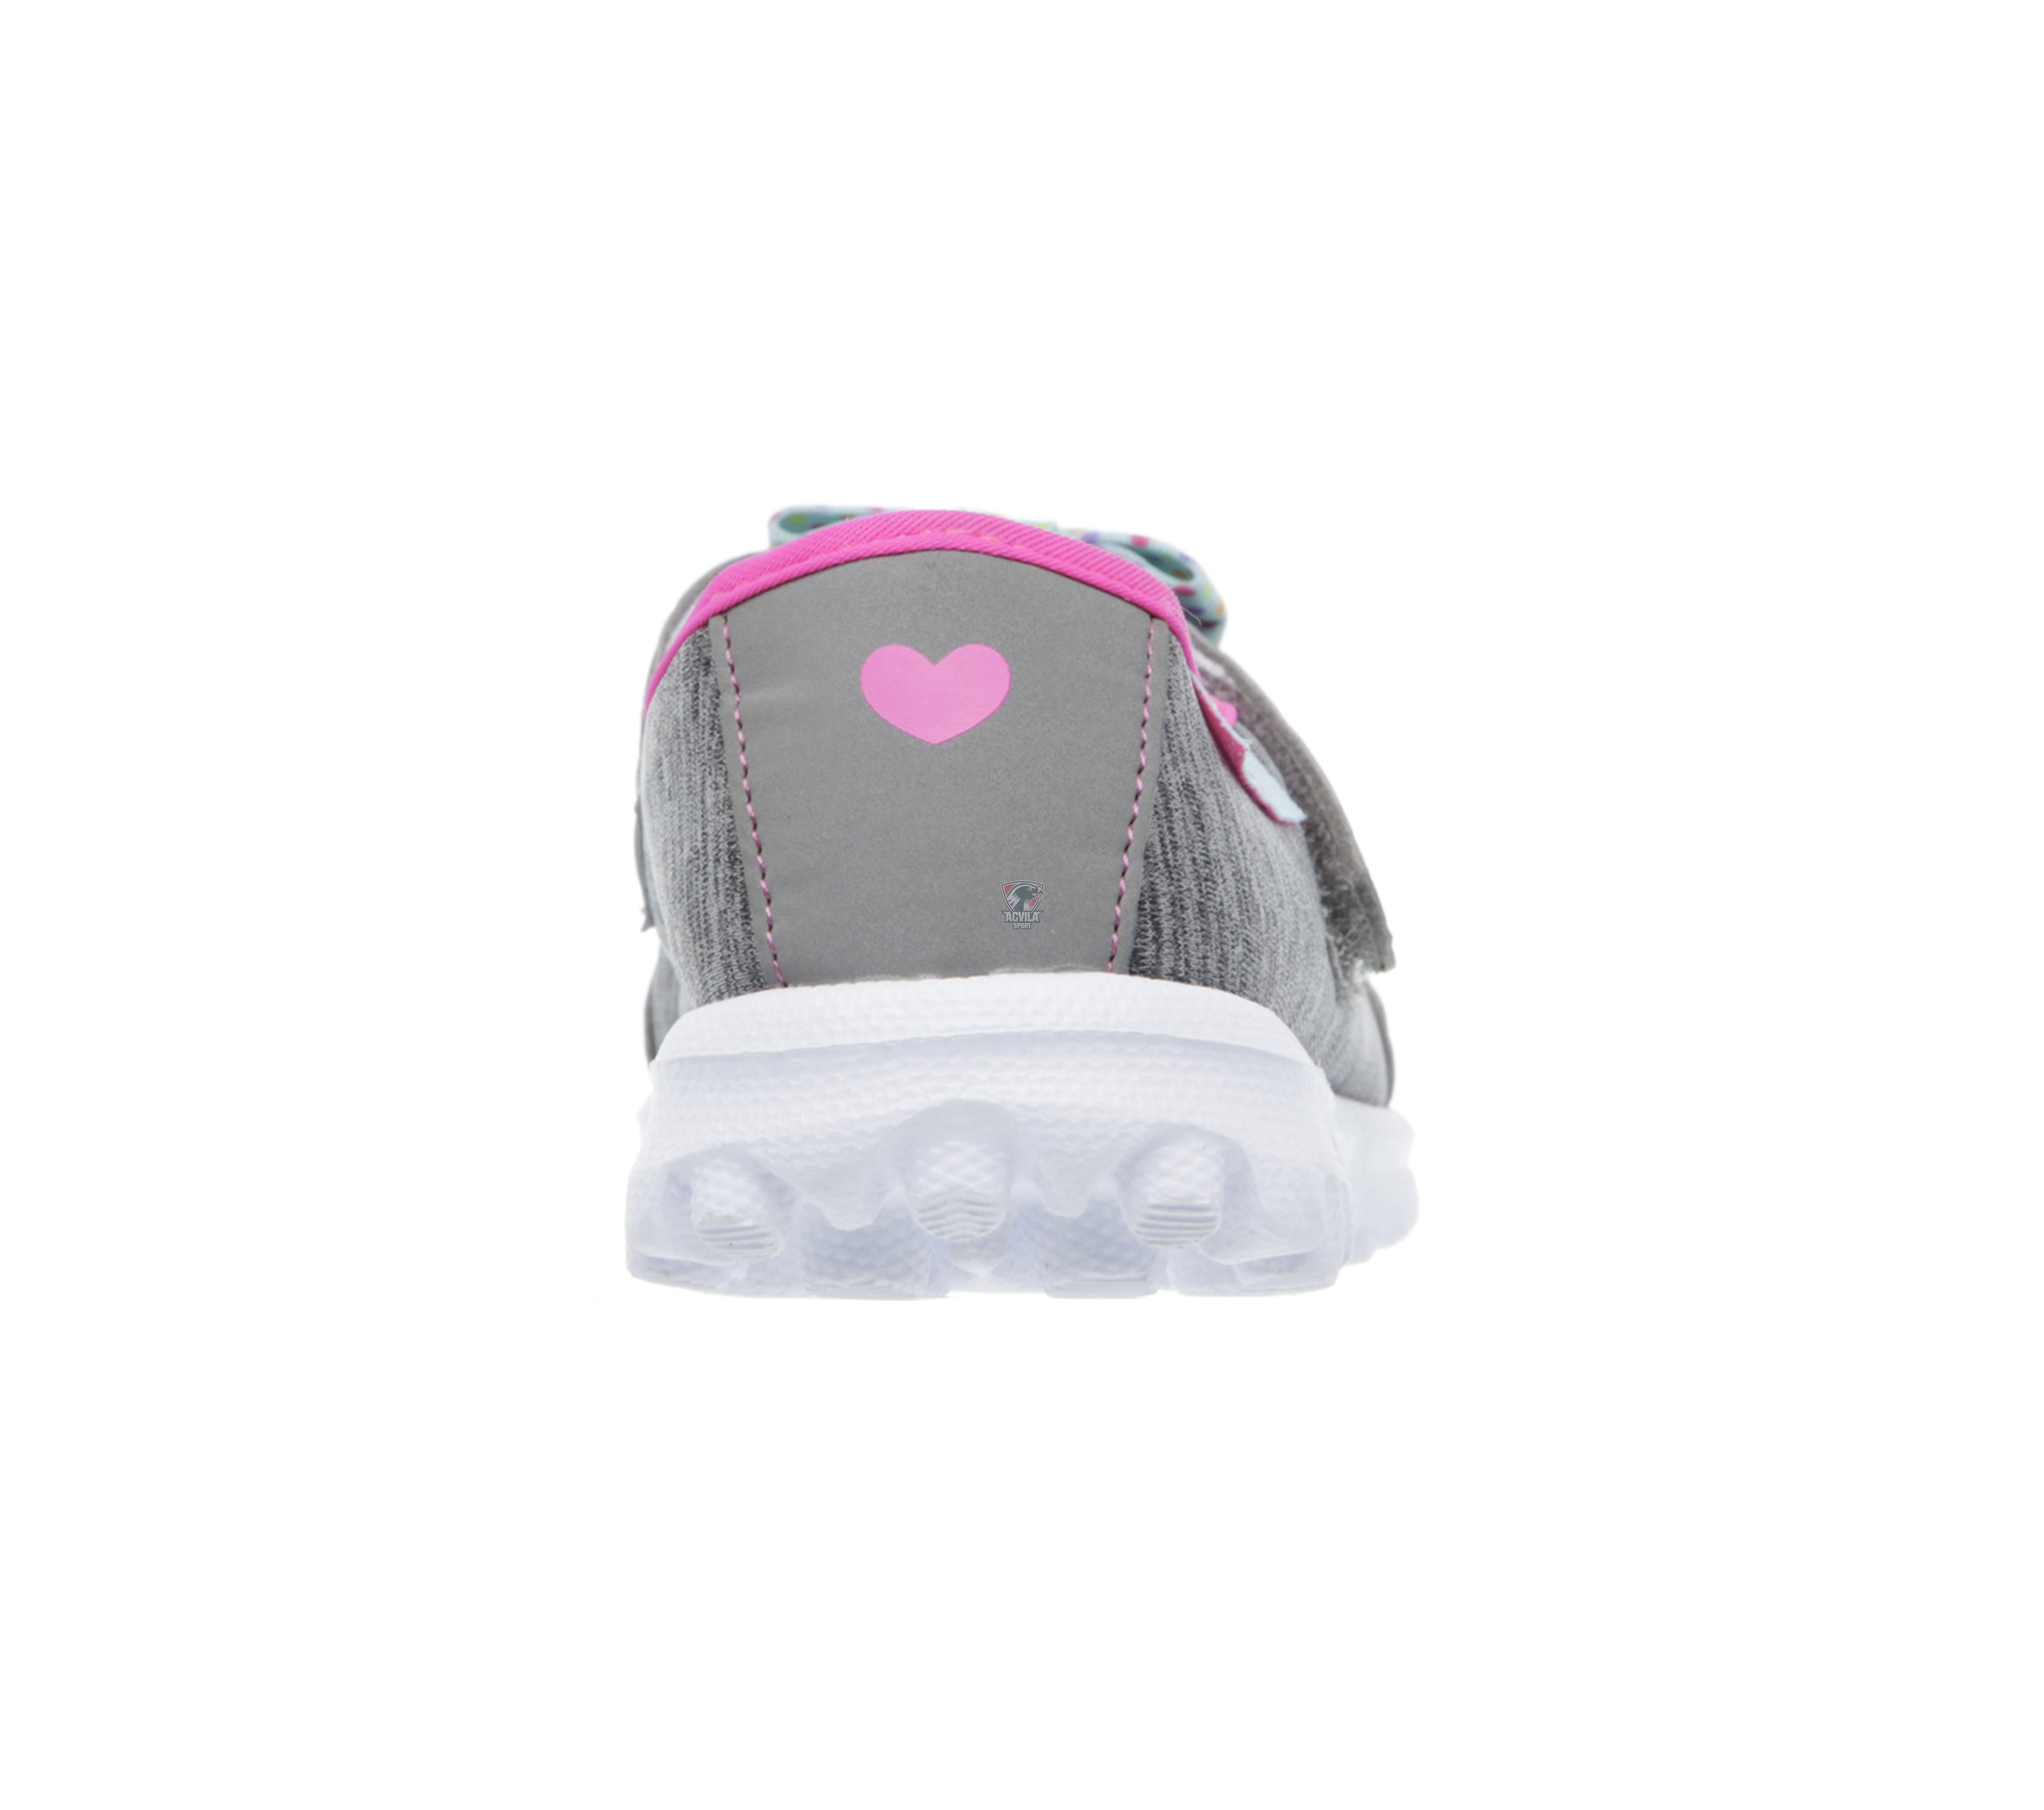 photo 1 Детская обувь SKECHERS GO WALK - BITTY BOW